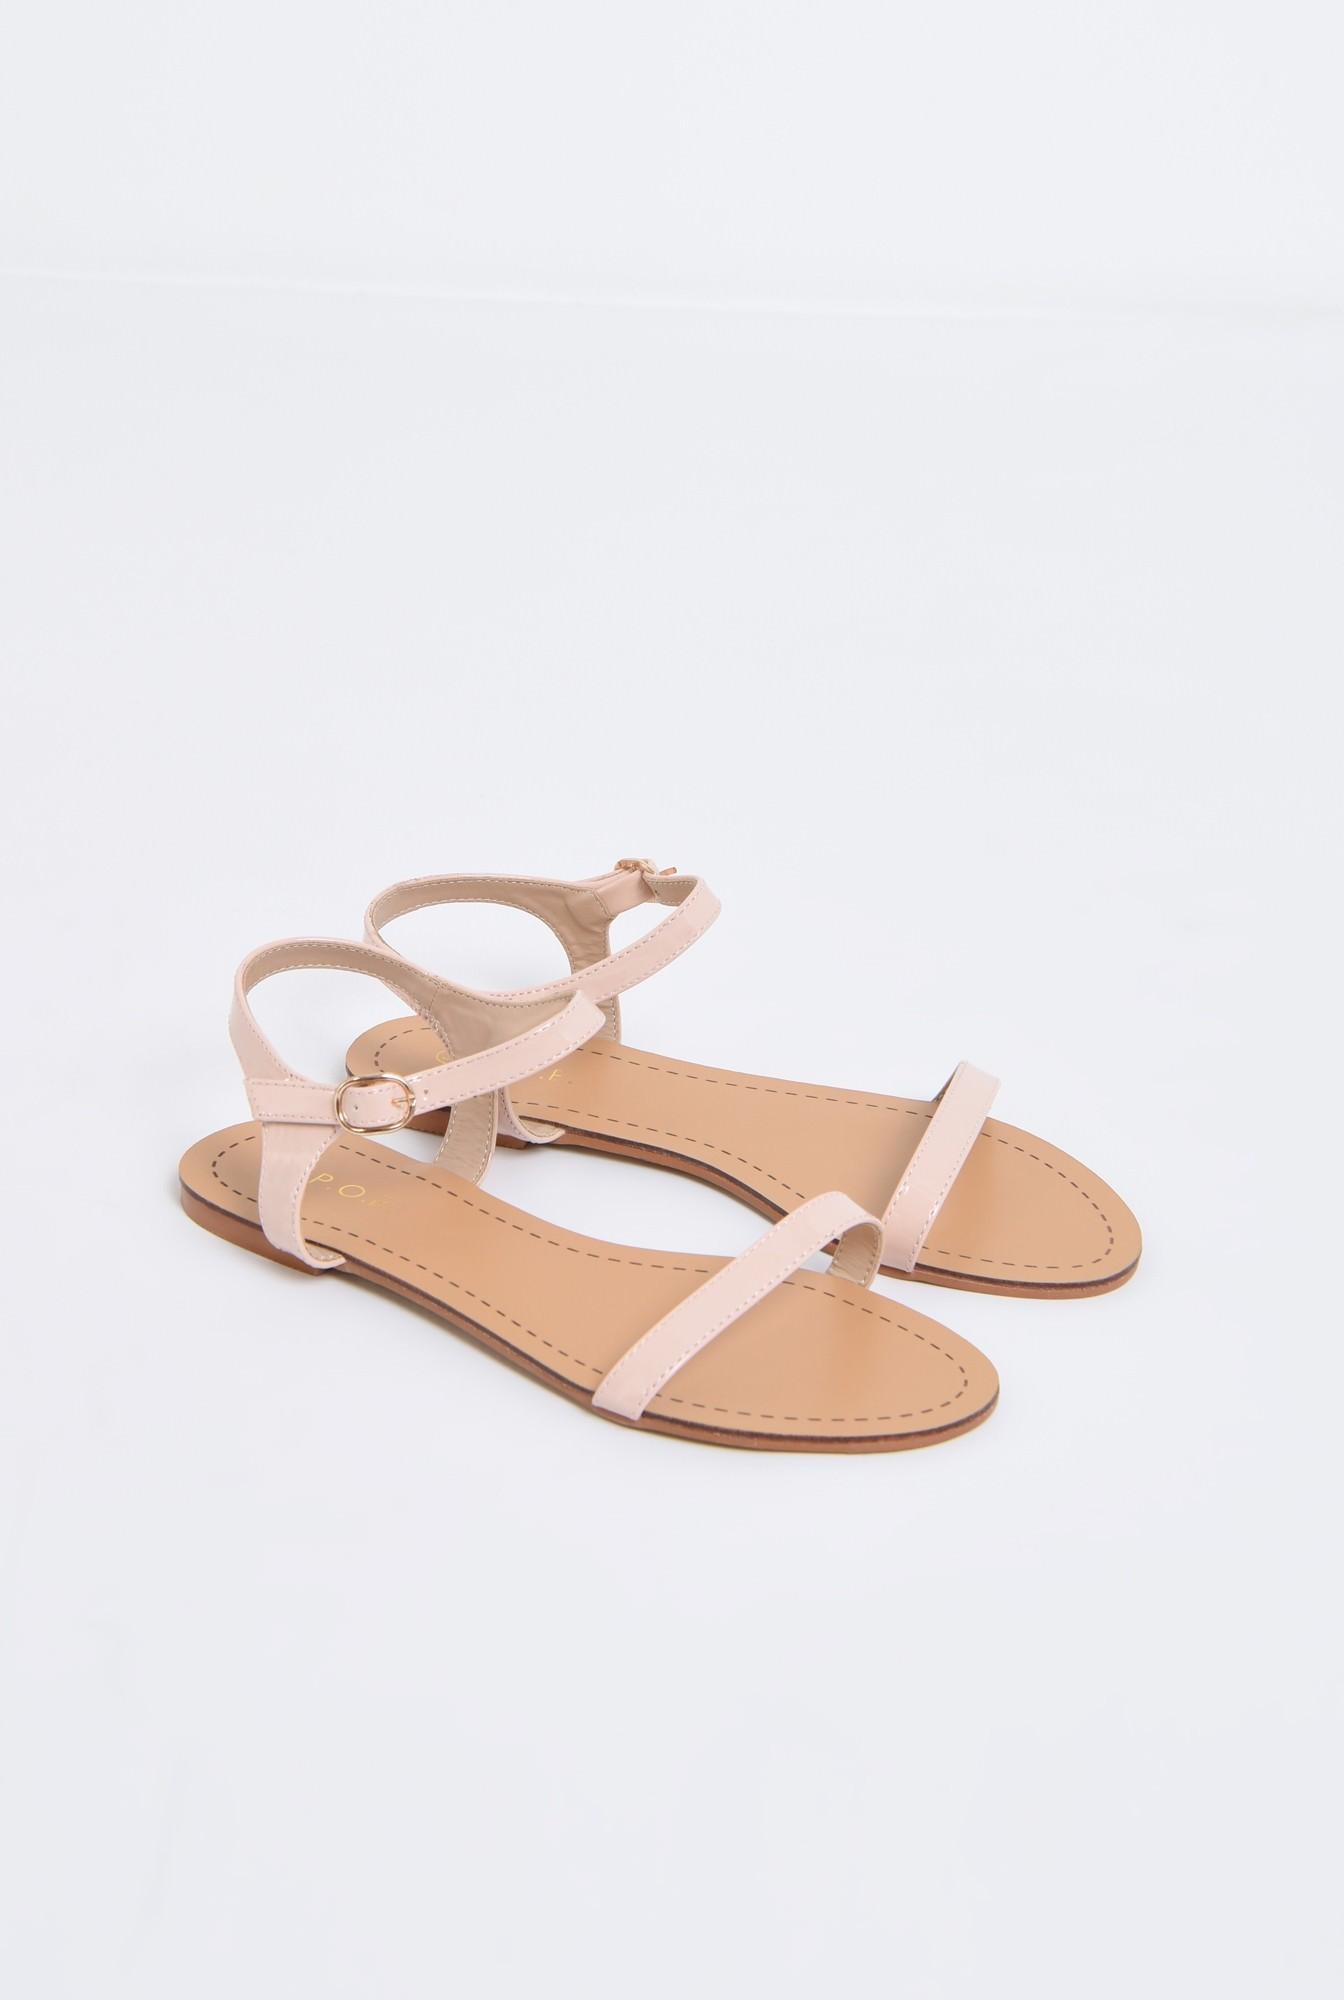 1 - sandale din lac, crem, minimaliste, talpa joasa